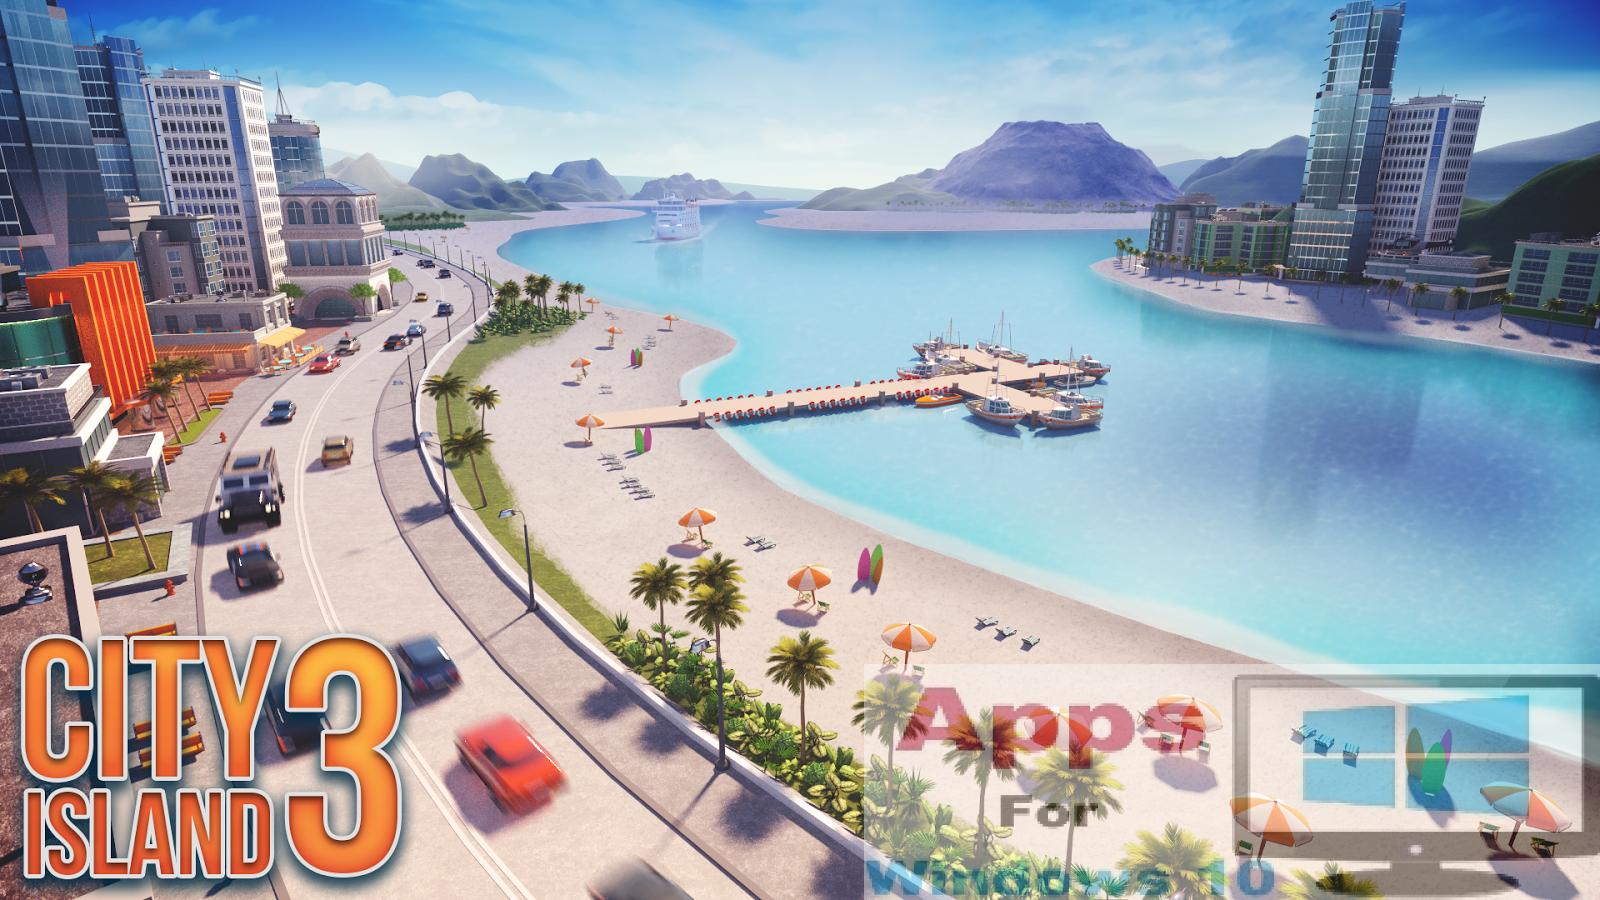 City_Island_3_for_Windows